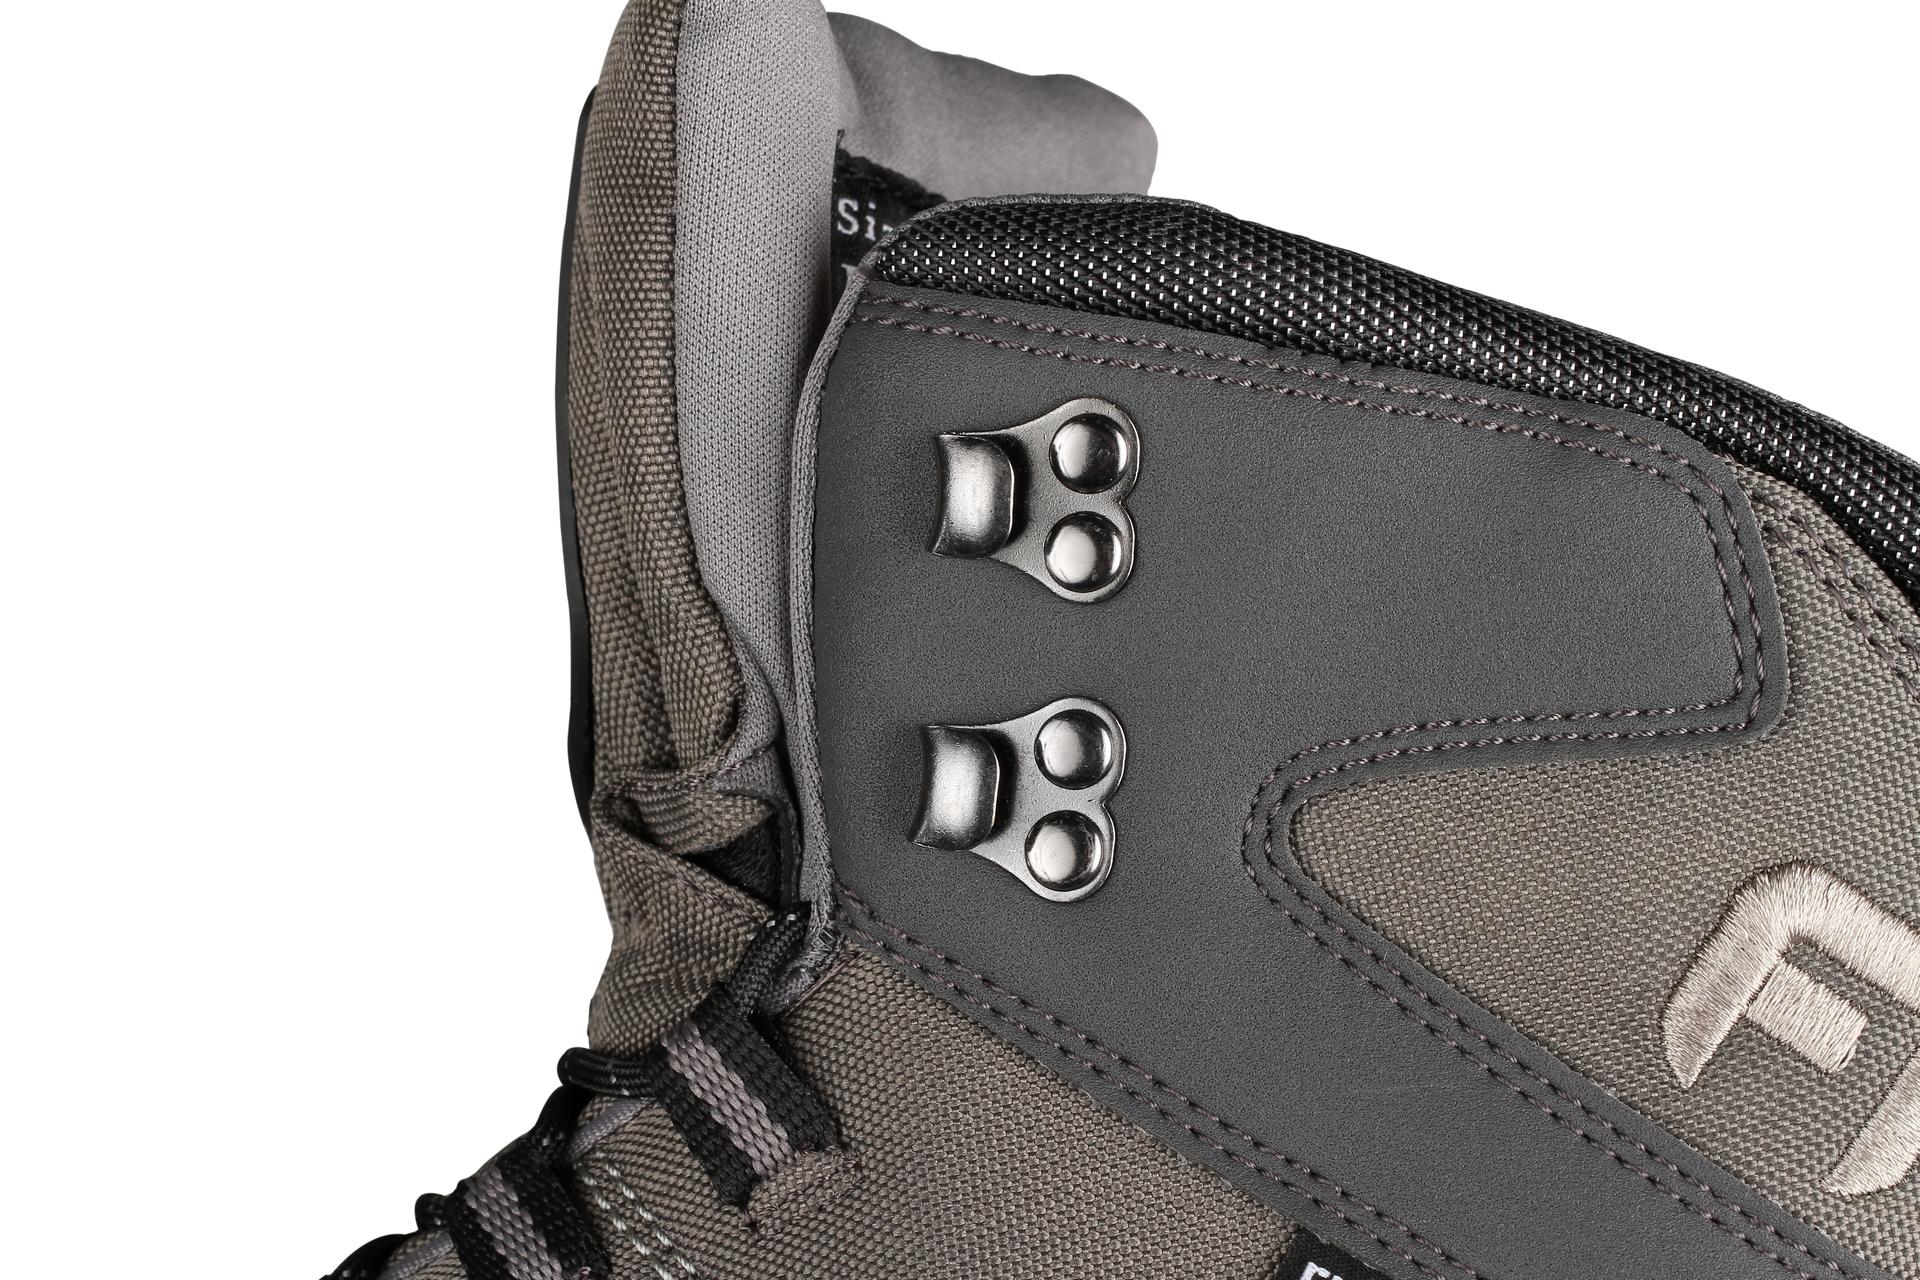 Забродные ботинки Finntrail NEW STALKER 5192 LIGHT GREY ― Артмото - купить квадроцикл в украине и харькове, мотоцикл, снегоход, скутер, мопед, электромобиль